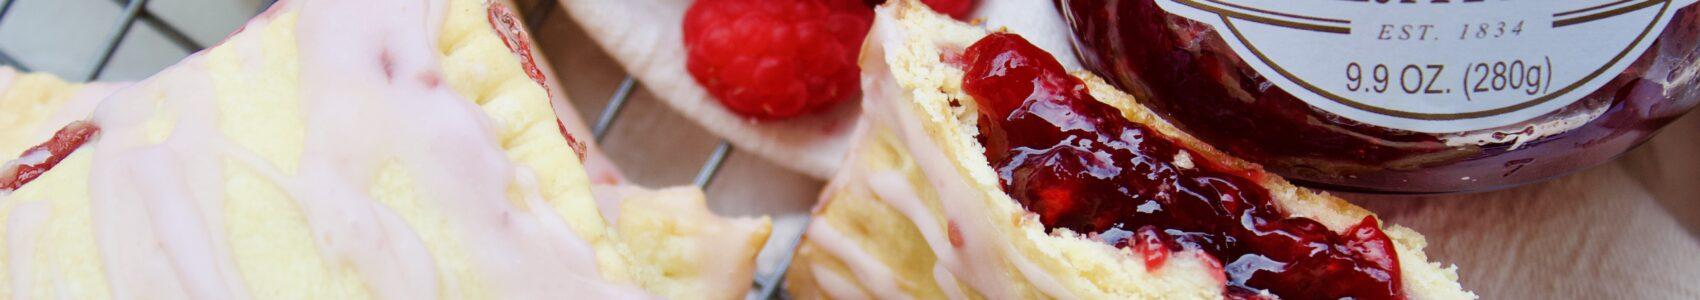 Homemade Raspberry Toaster Pastries